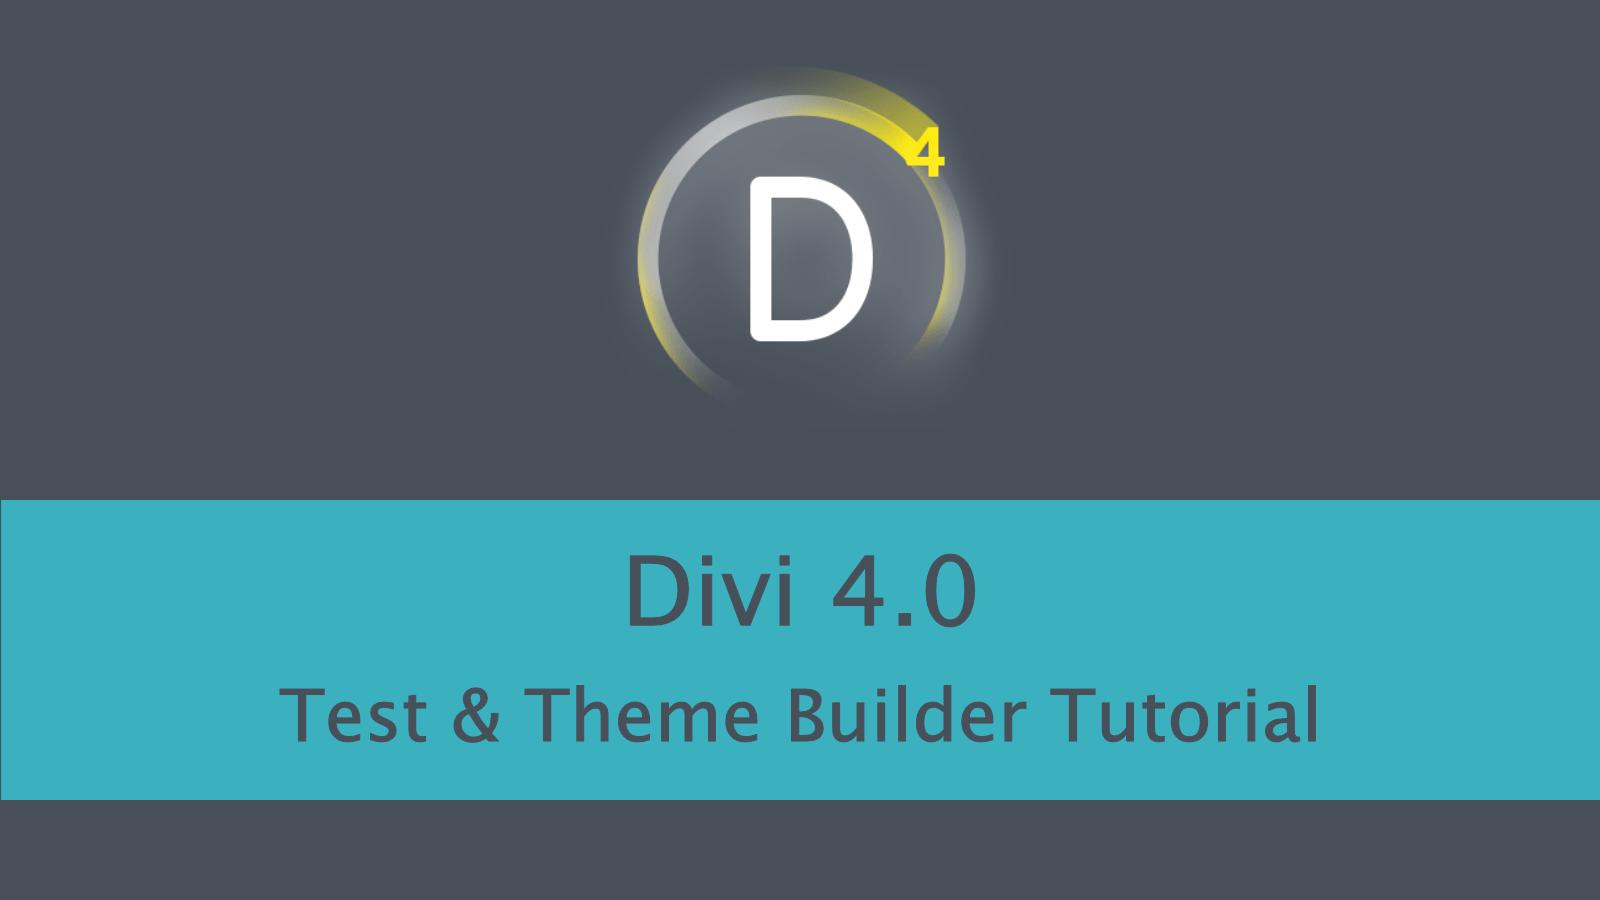 Divi 4.0 Test & Theme Builder Tutorial